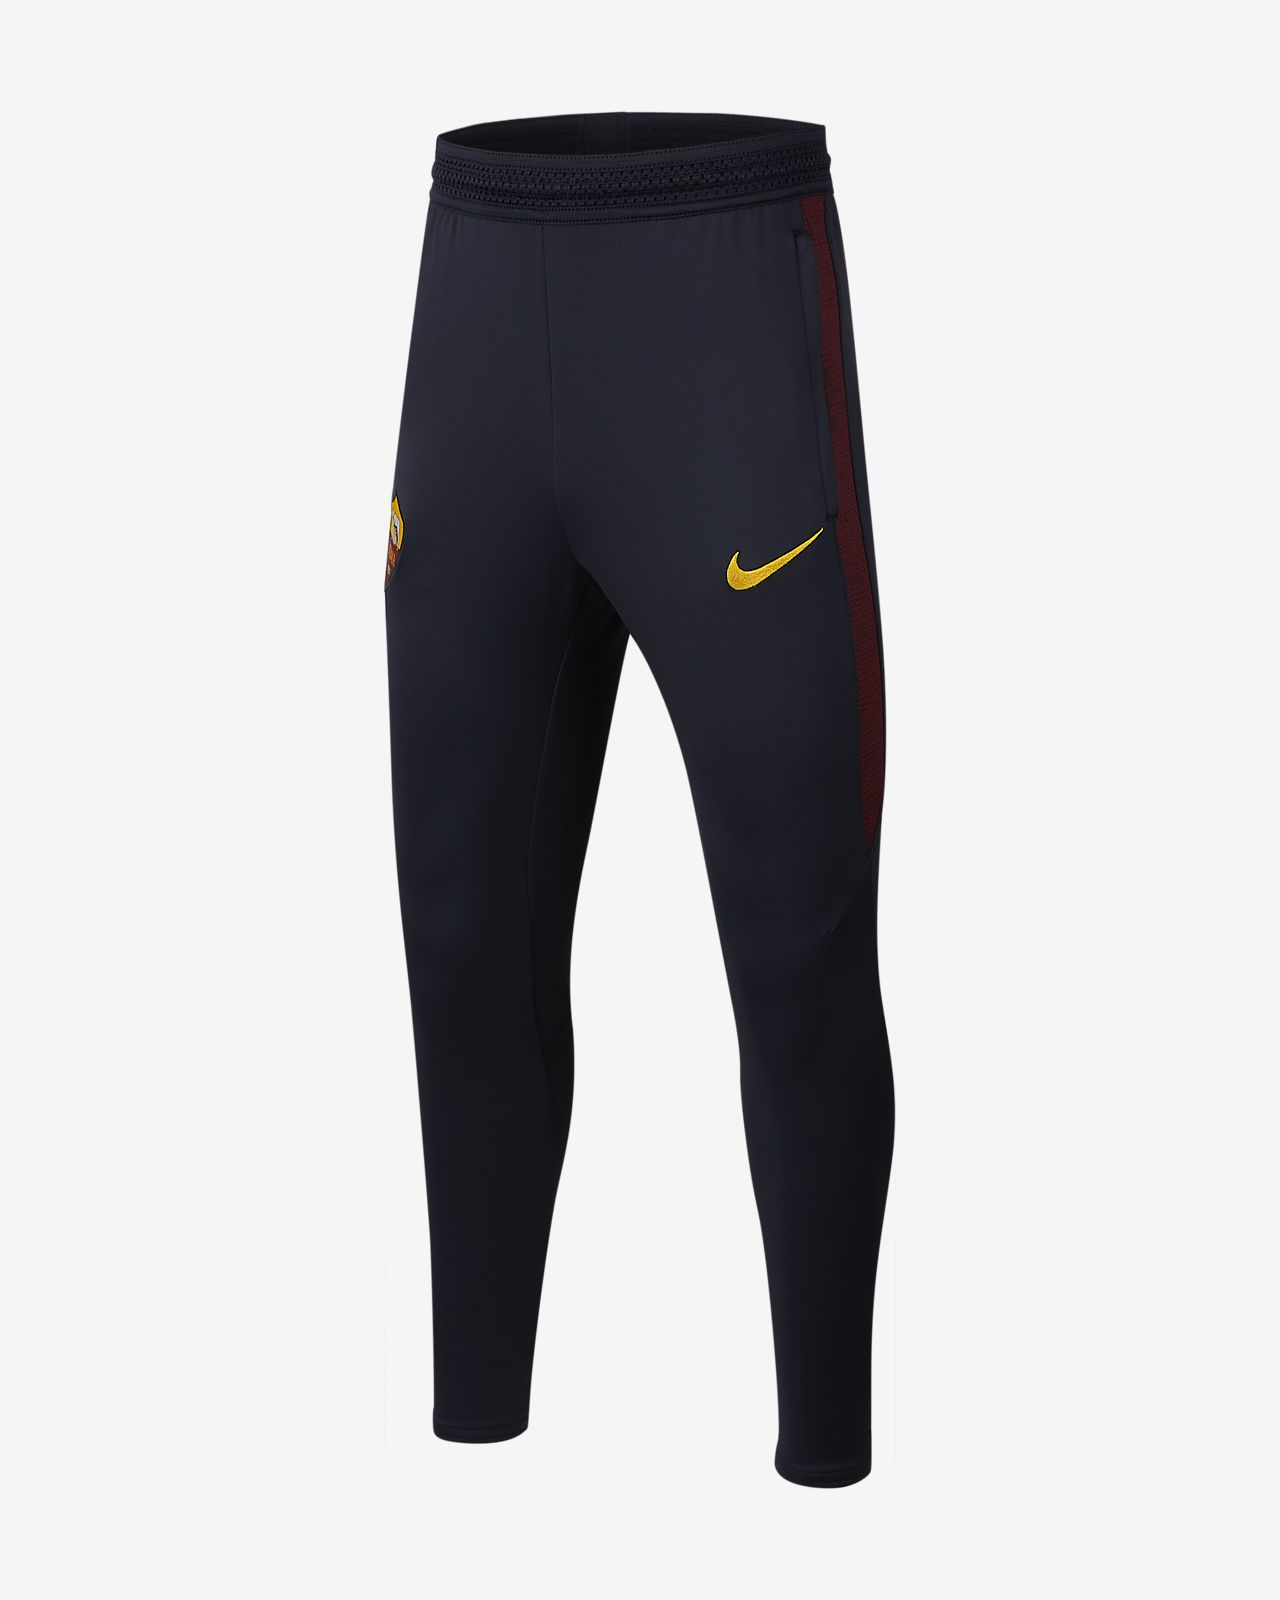 Fotbollsbyxor Nike Dri-FIT A.S. Roma Strike för ungdom